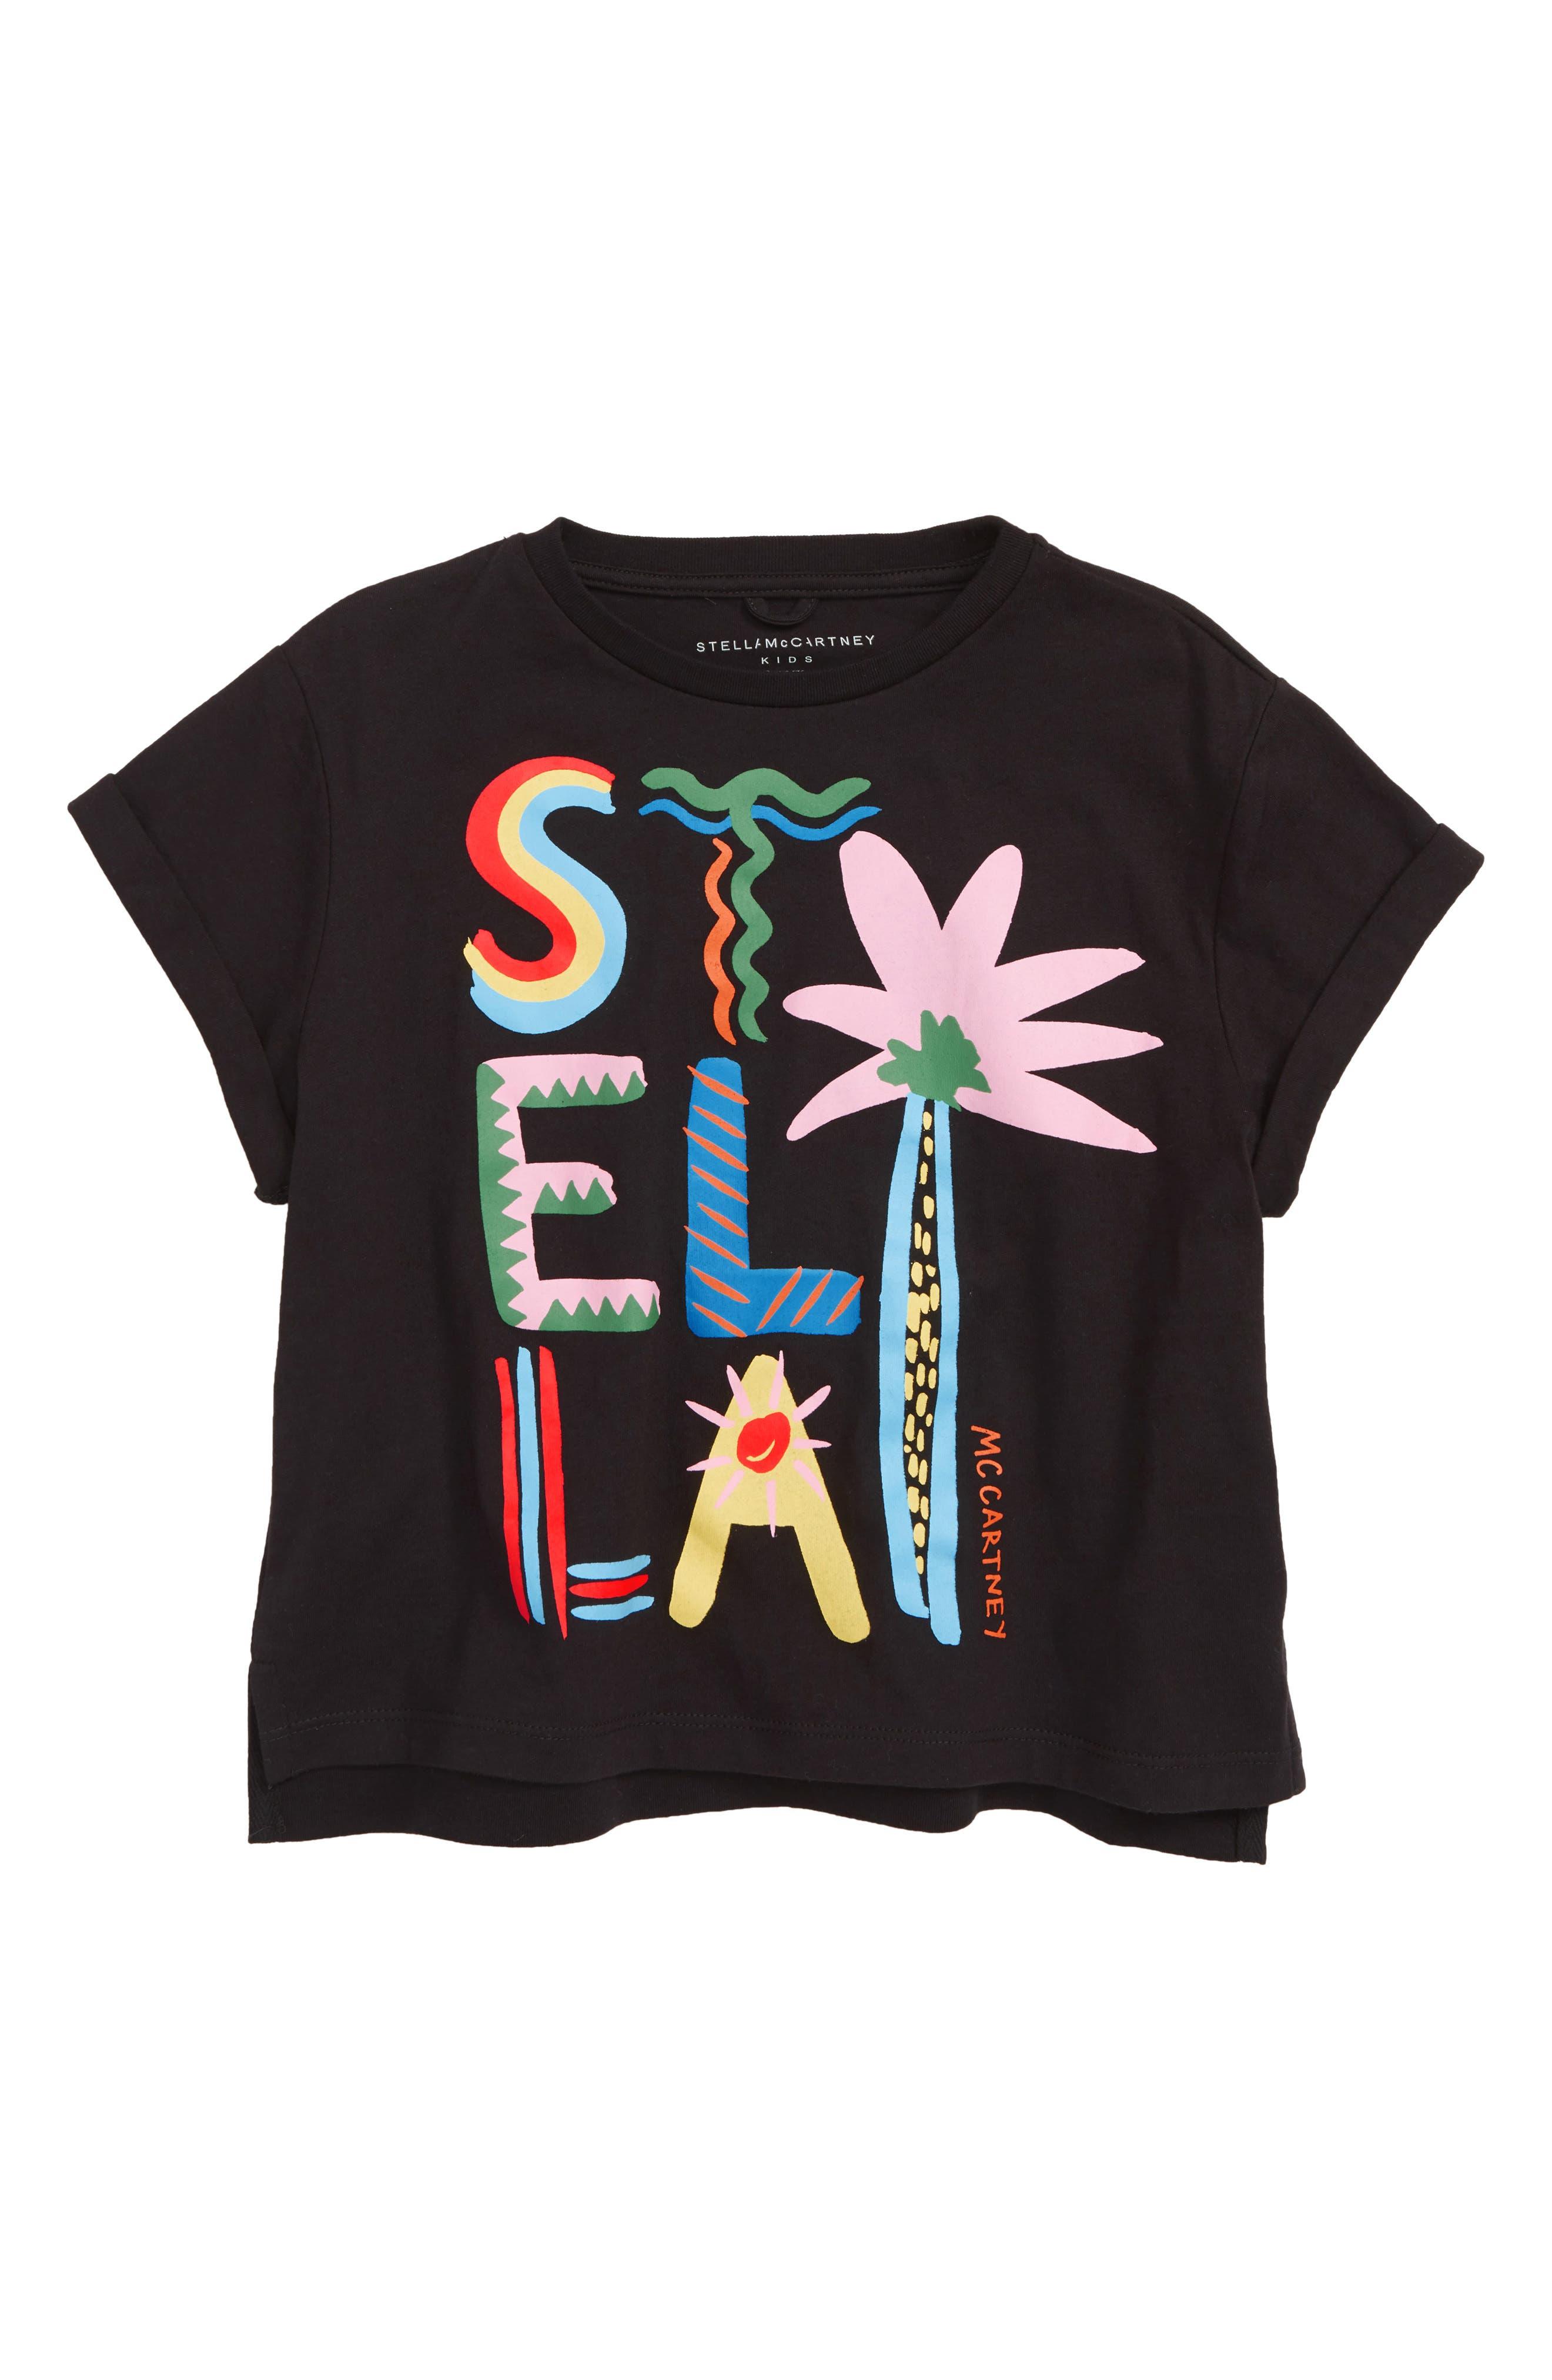 STELLA MCCARTNEY KIDS, Logo Print Tee, Main thumbnail 1, color, 1073 BLACK